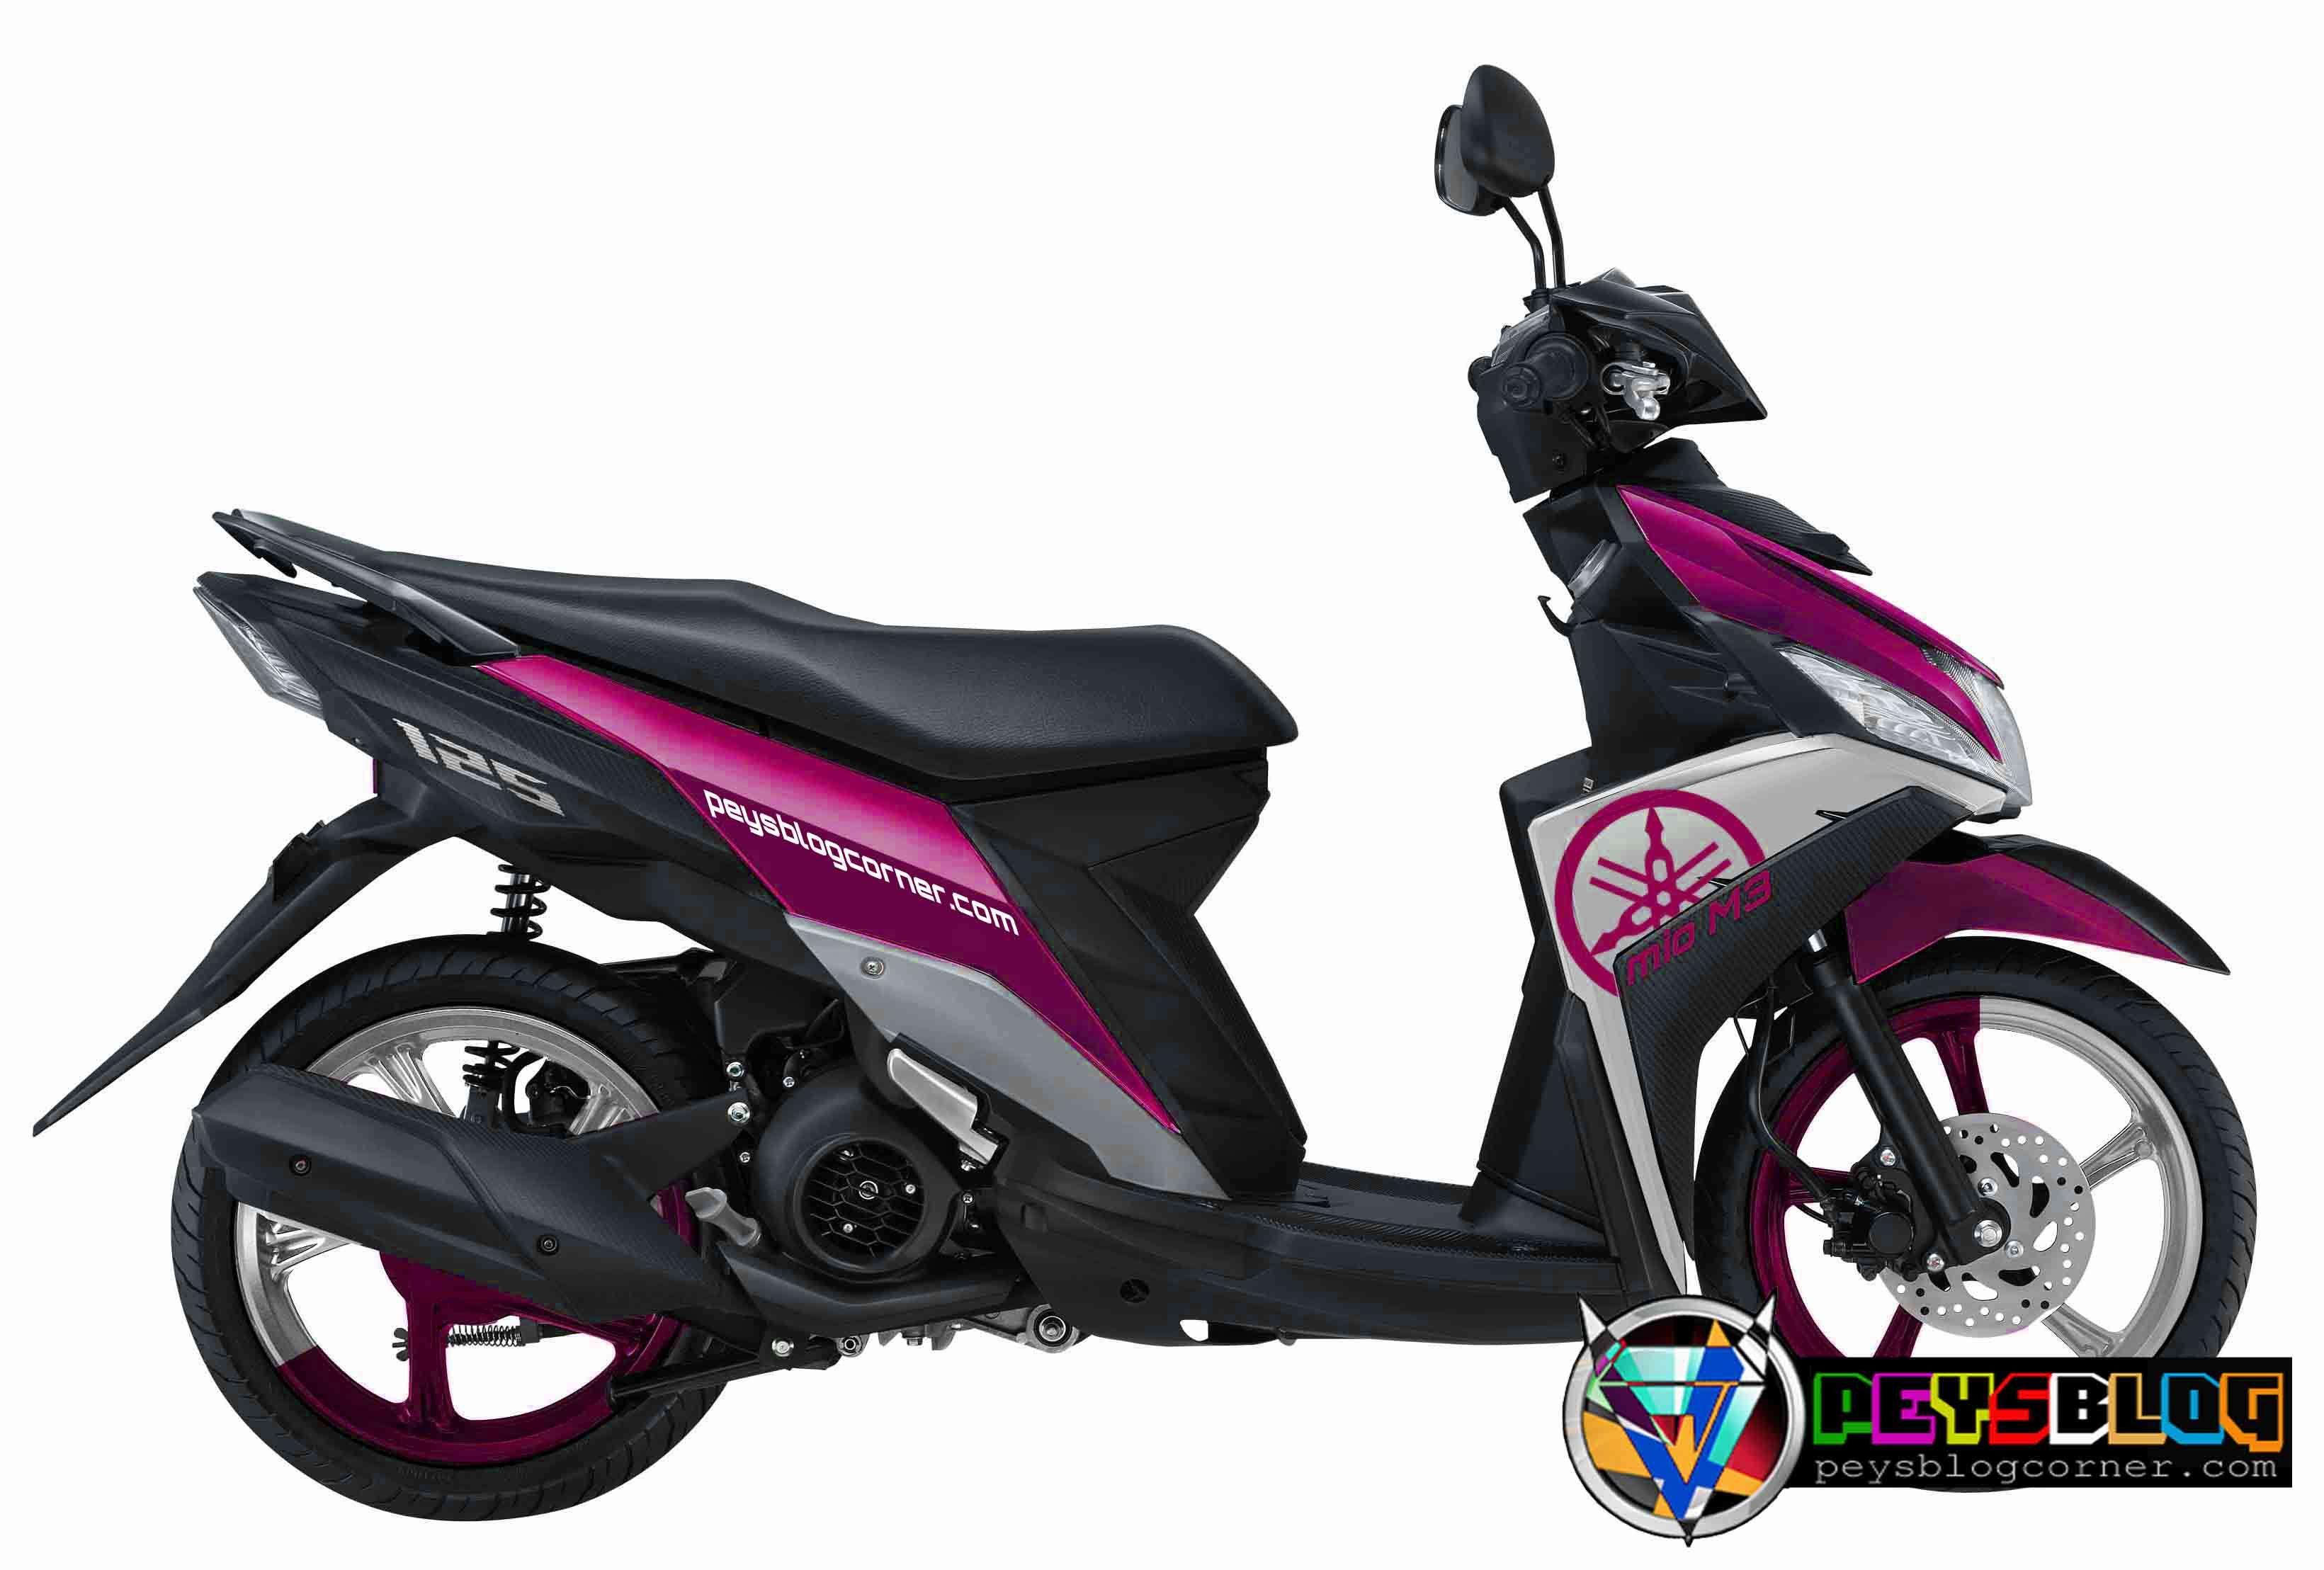 Modifikasi Motor Mio M3 Warna Pink Motor Warna Lowrider